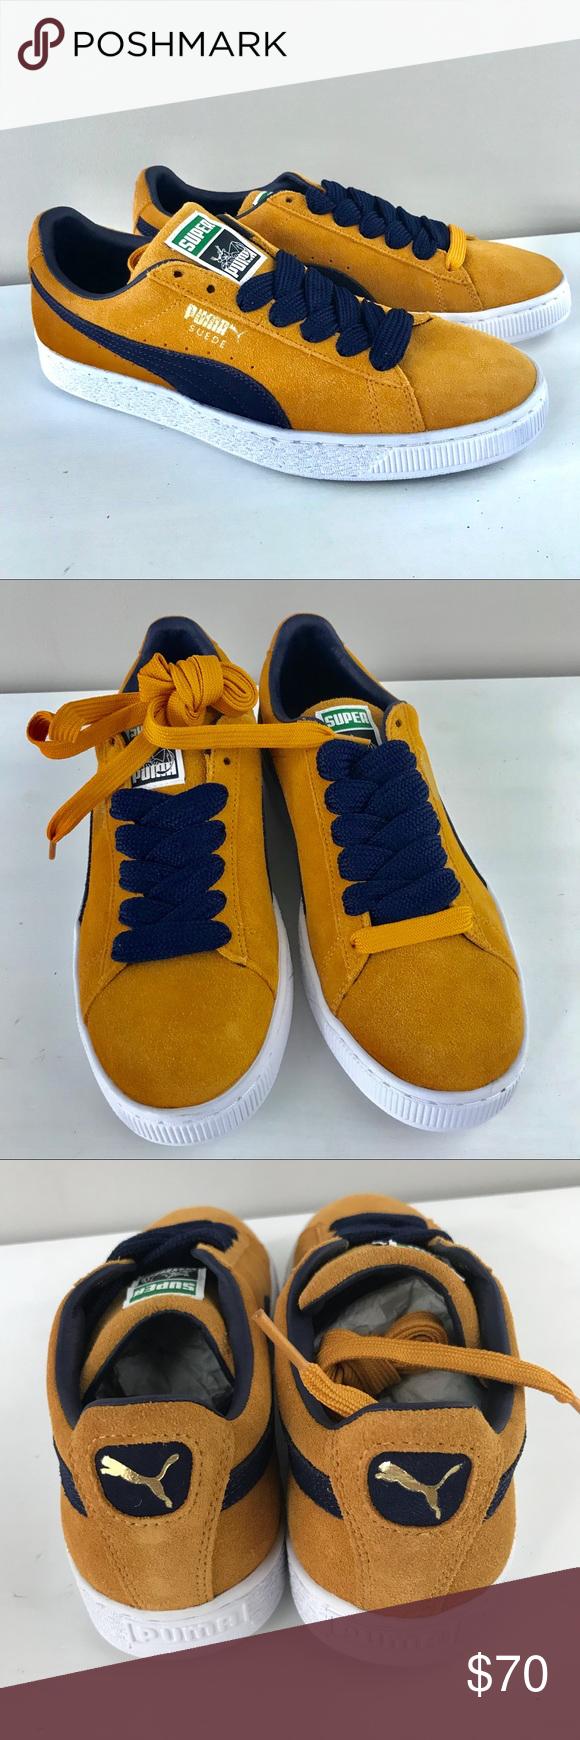 size 40 462f0 dccfb Puma NEW Suede Super gold blue lo rise sneakers Puma suede ...